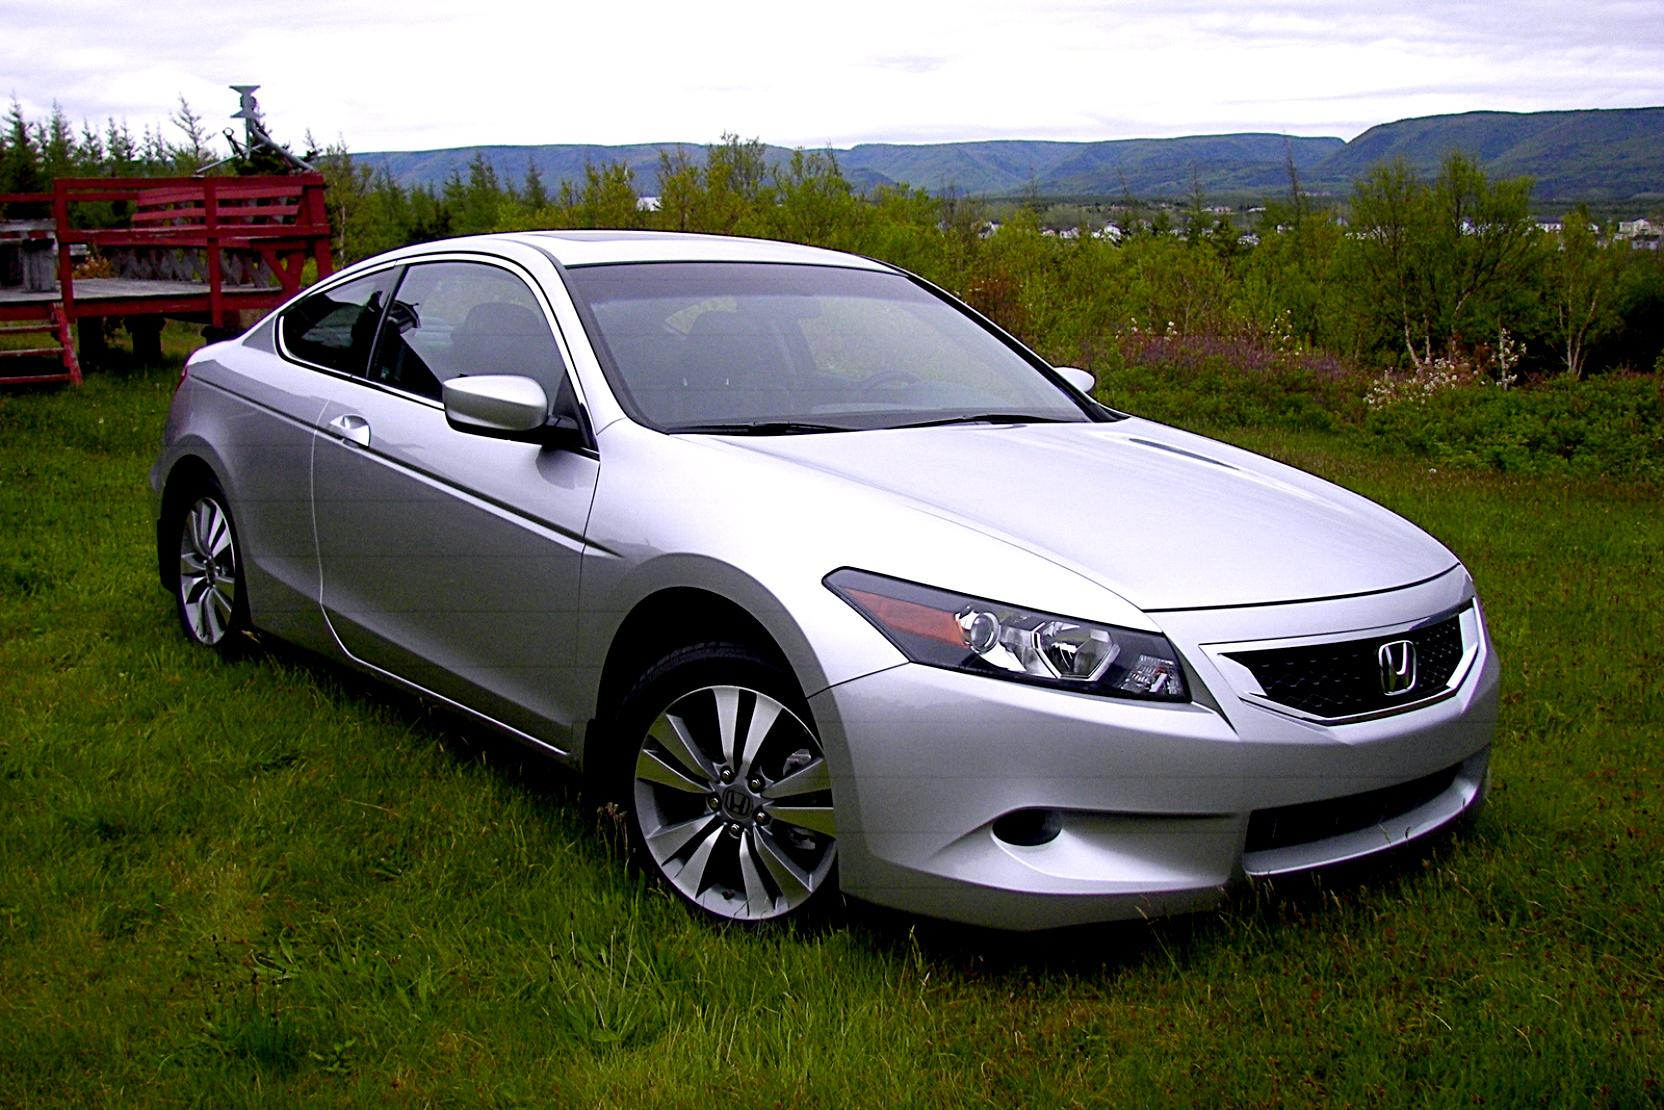 Honda Accord Coupe US 2008 #2